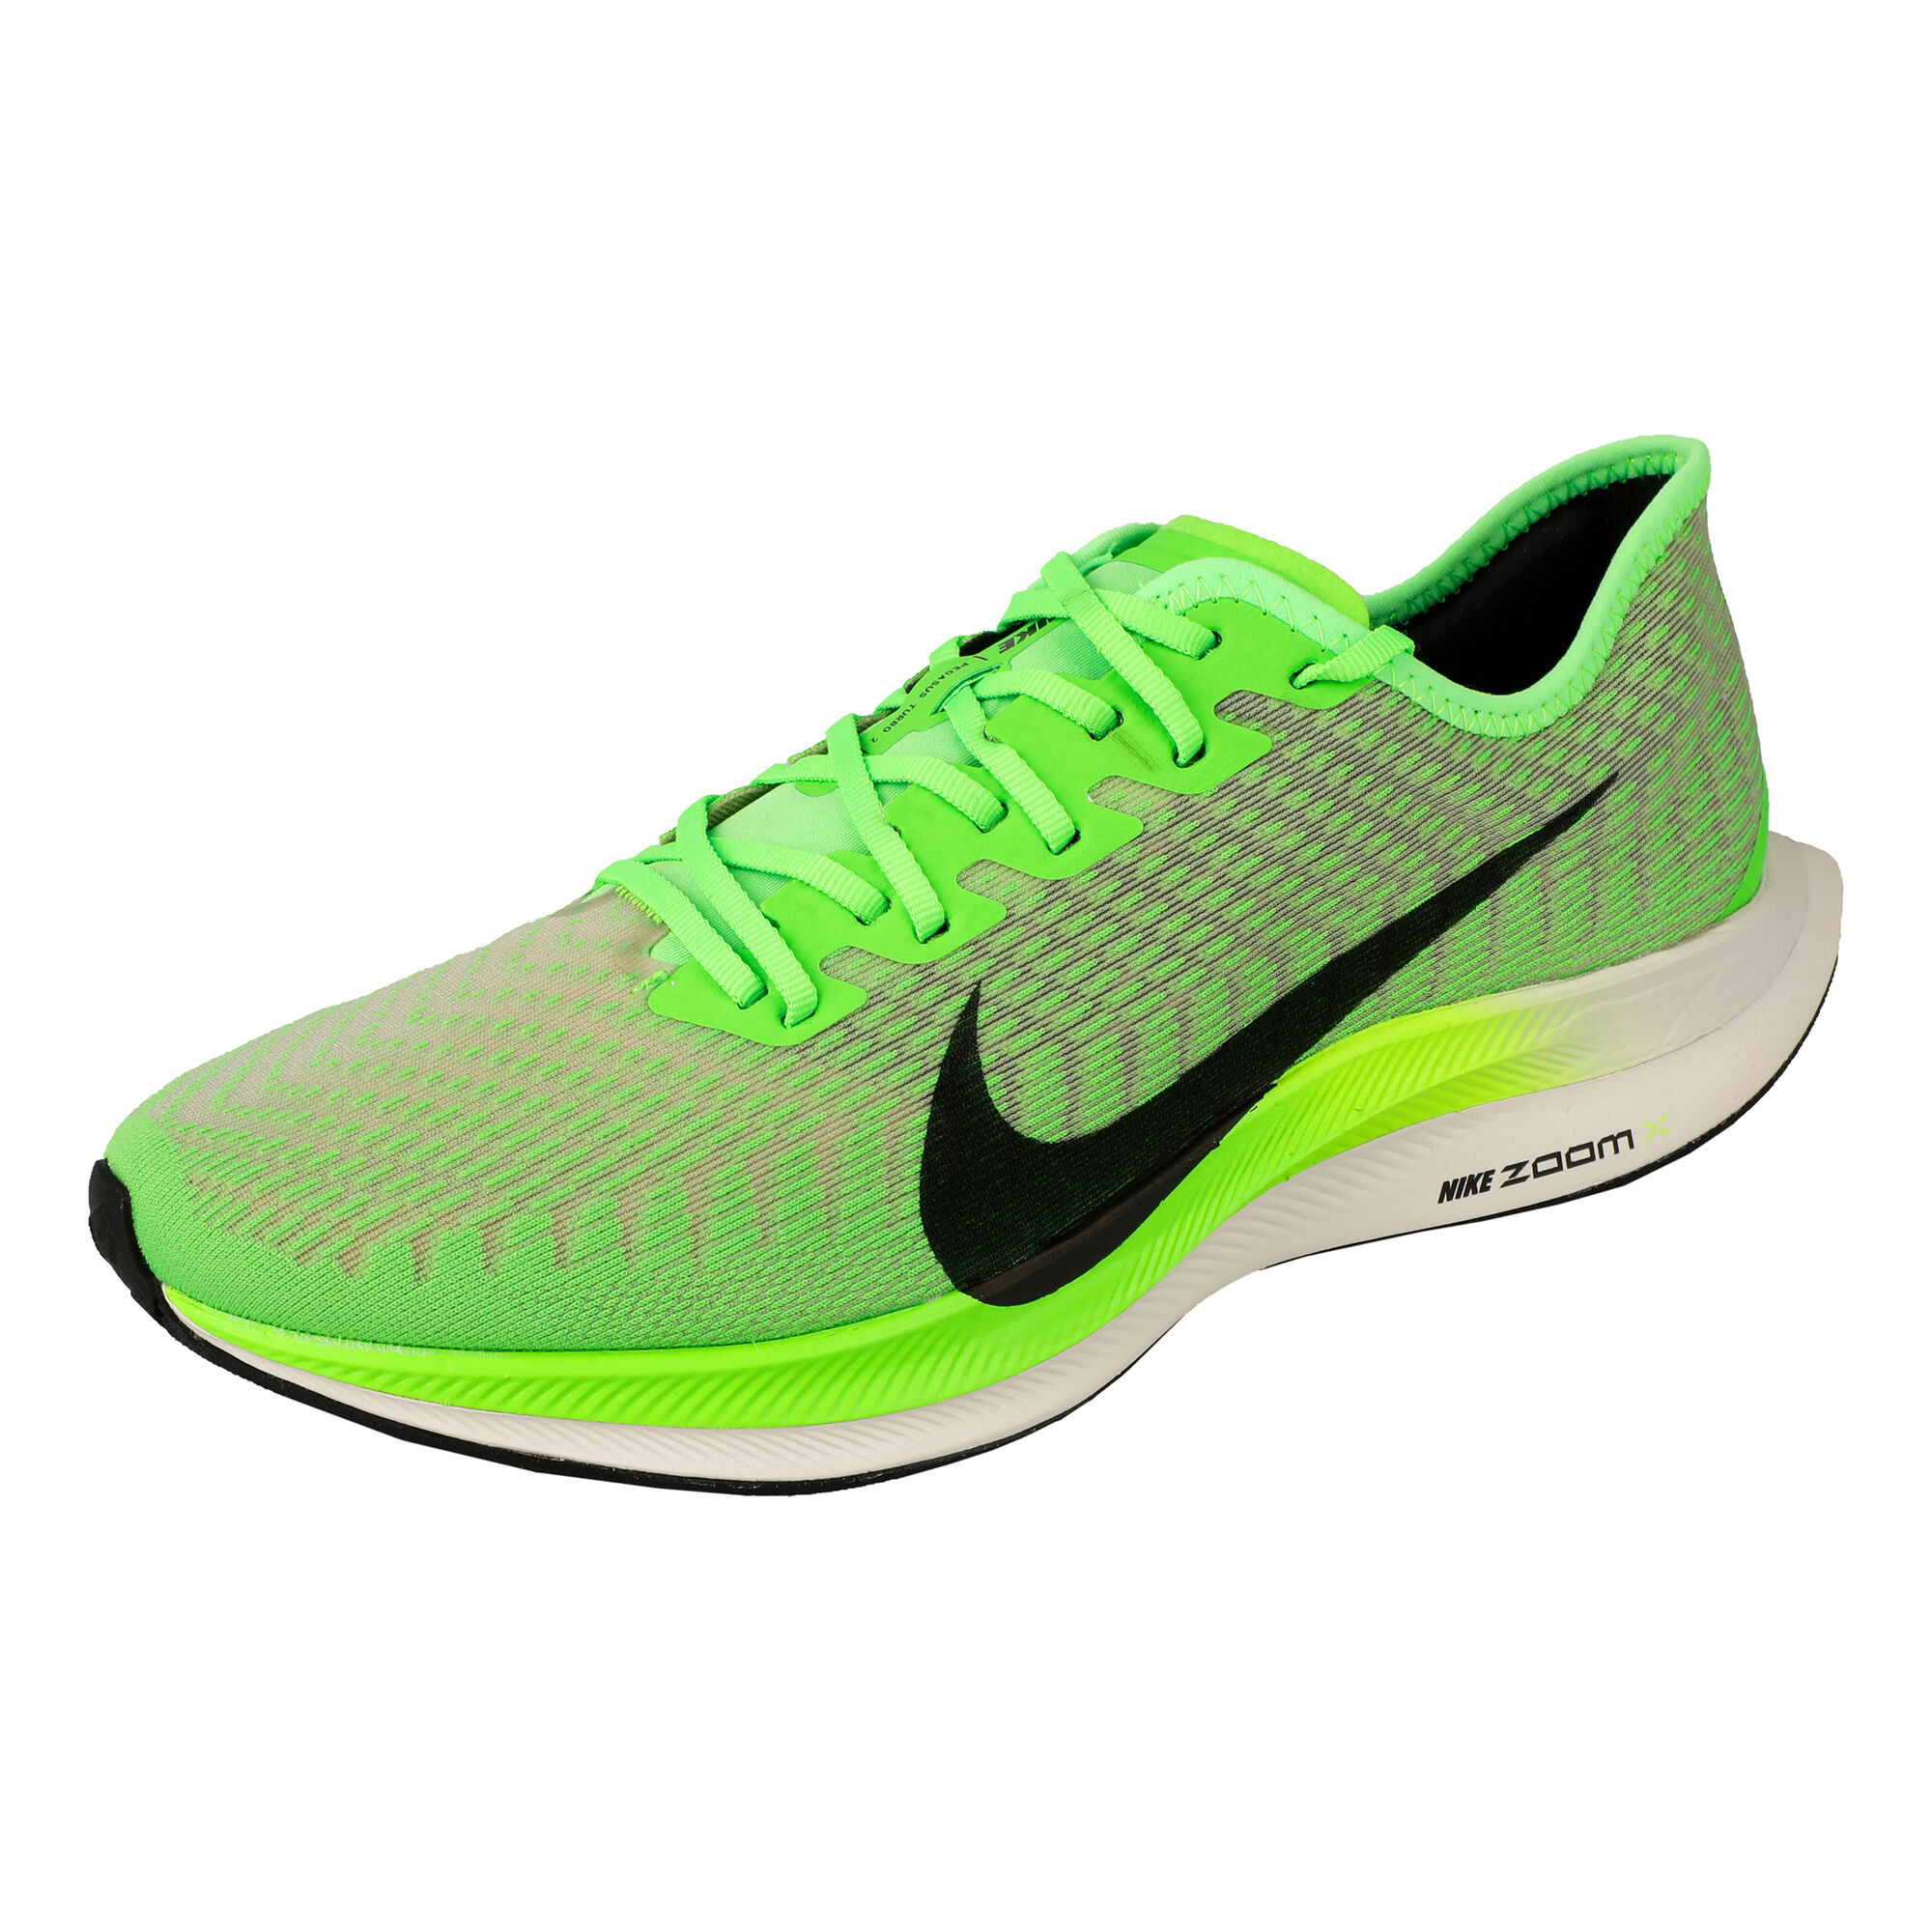 grua acelerador Permanentemente  buy Nike Zoom Turbo 3 Neutral Running Shoe Men - Light Green, White online  | Jogging-Point